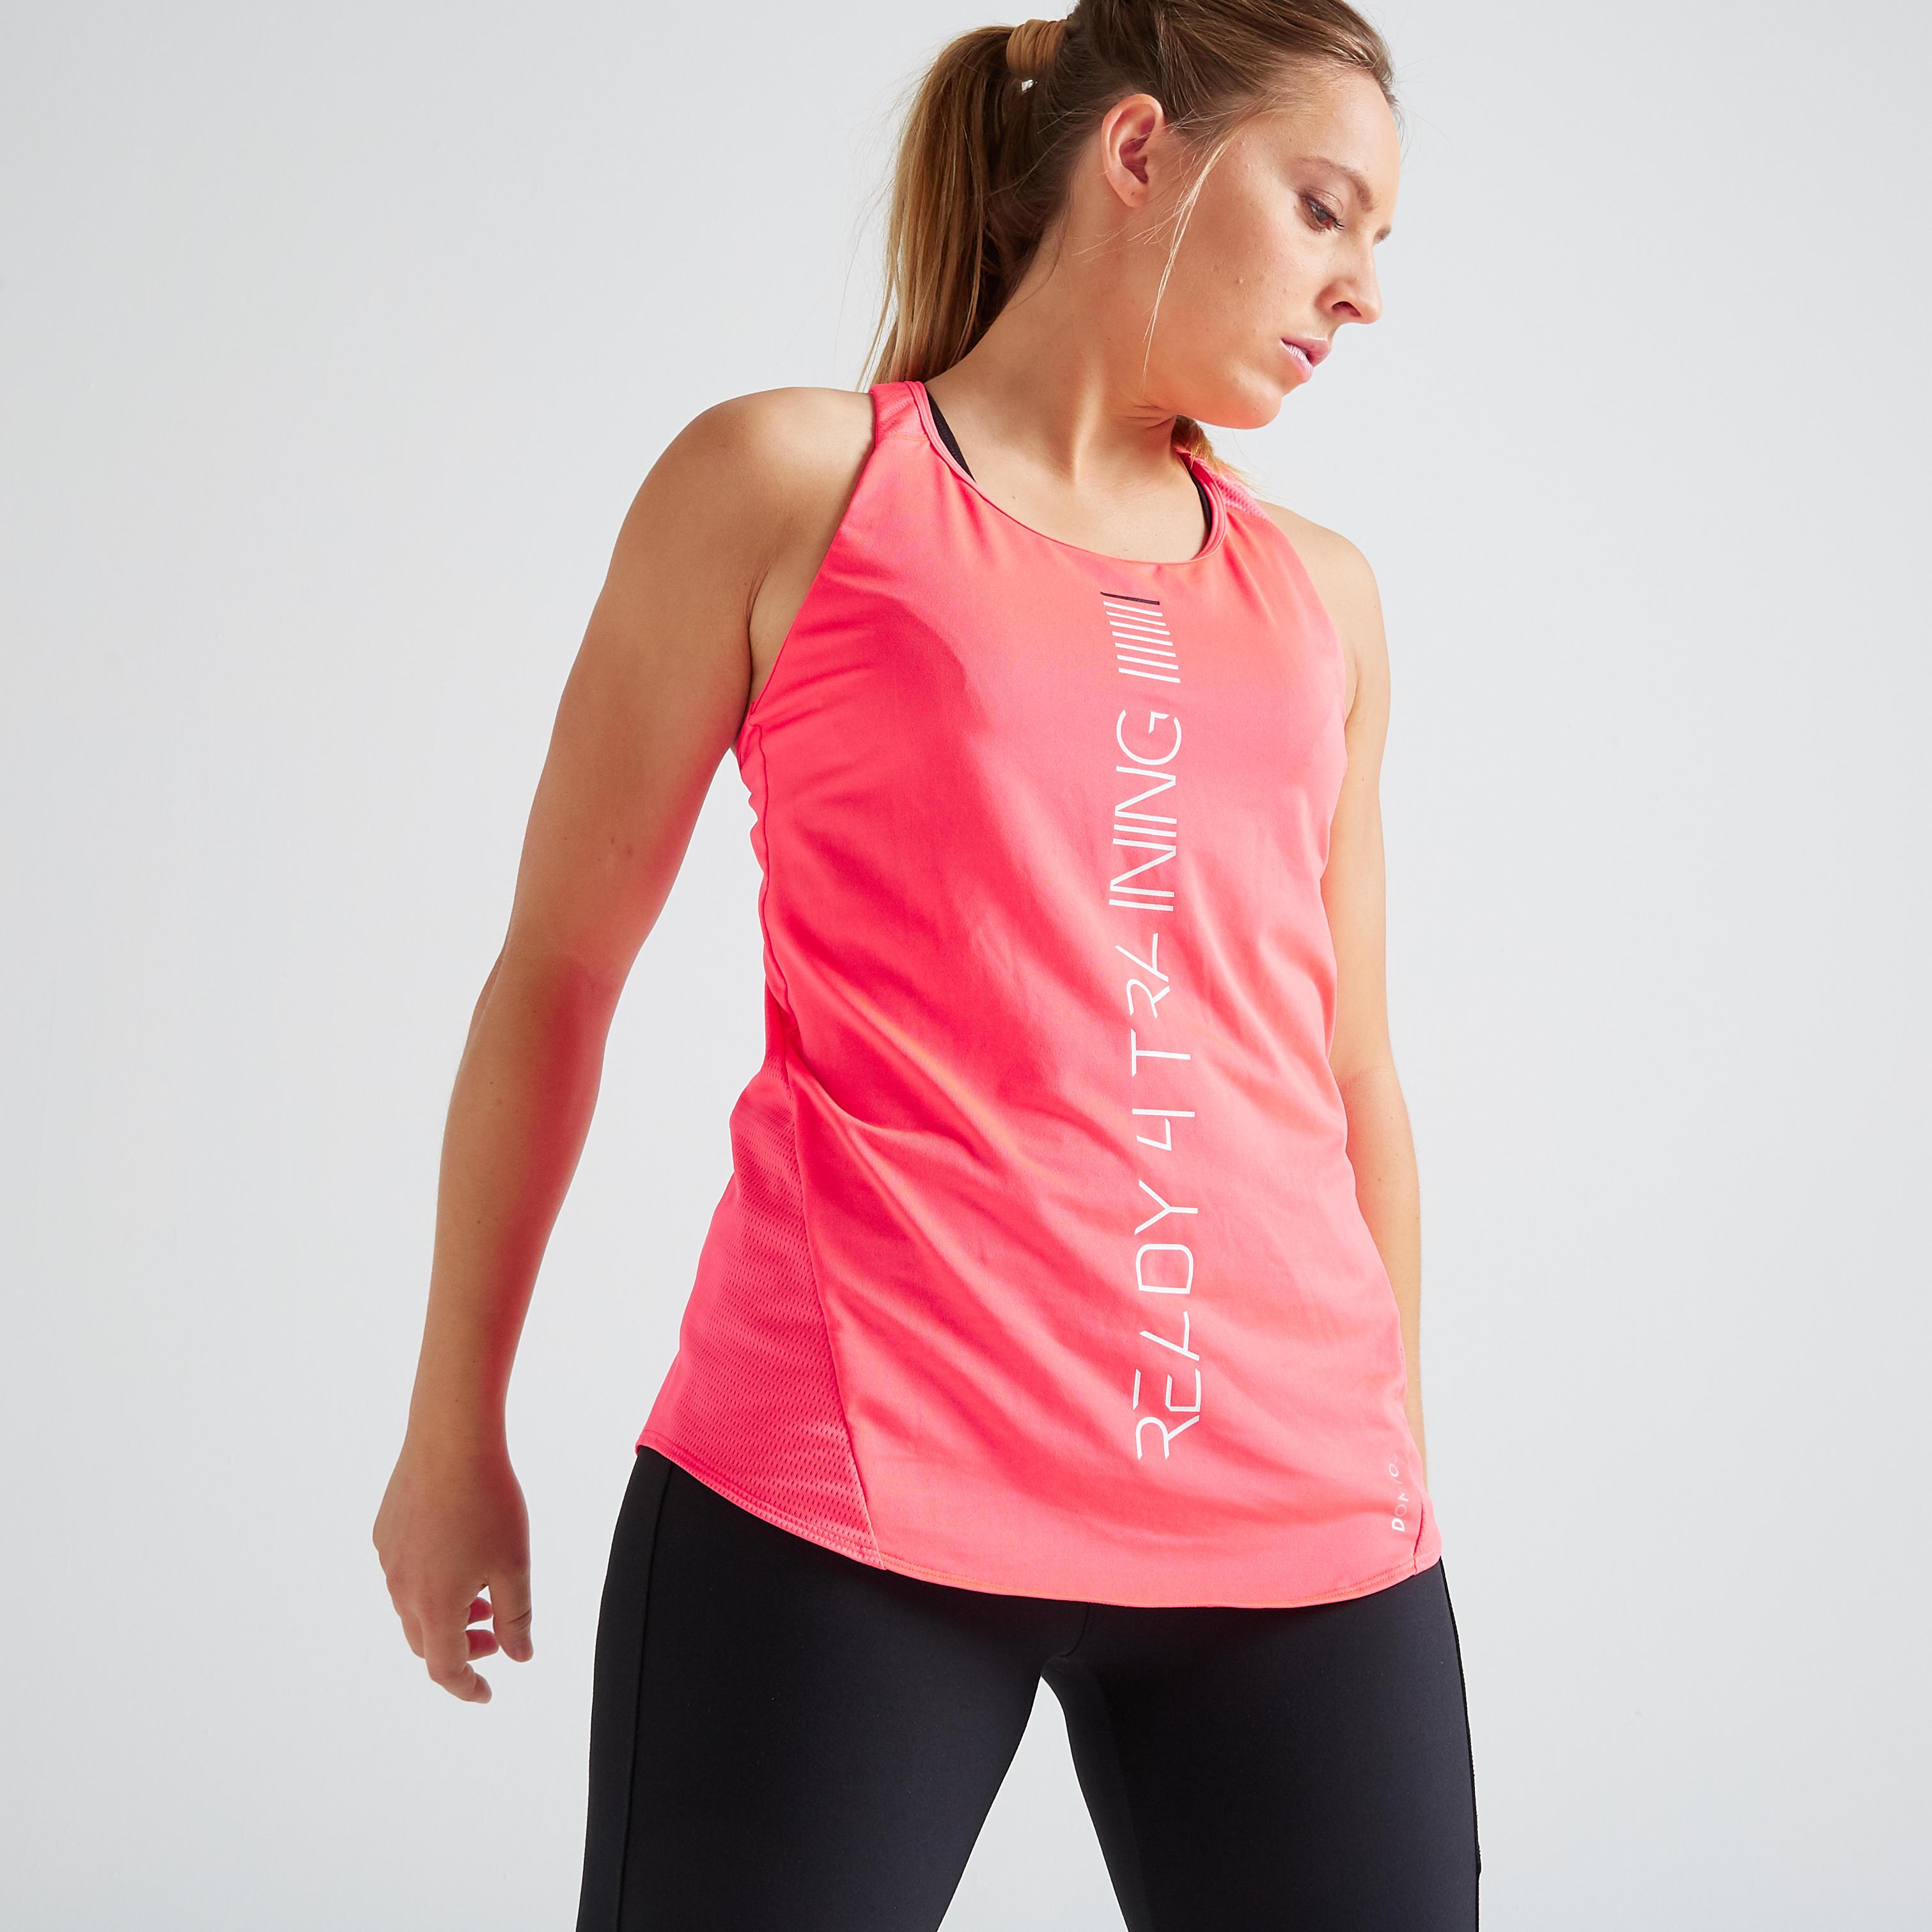 Top FTA 120 Fitness Cardio Damen rosa | Sportbekleidung > Sporttops > Trainingstops | Rot - Rosa | Domyos